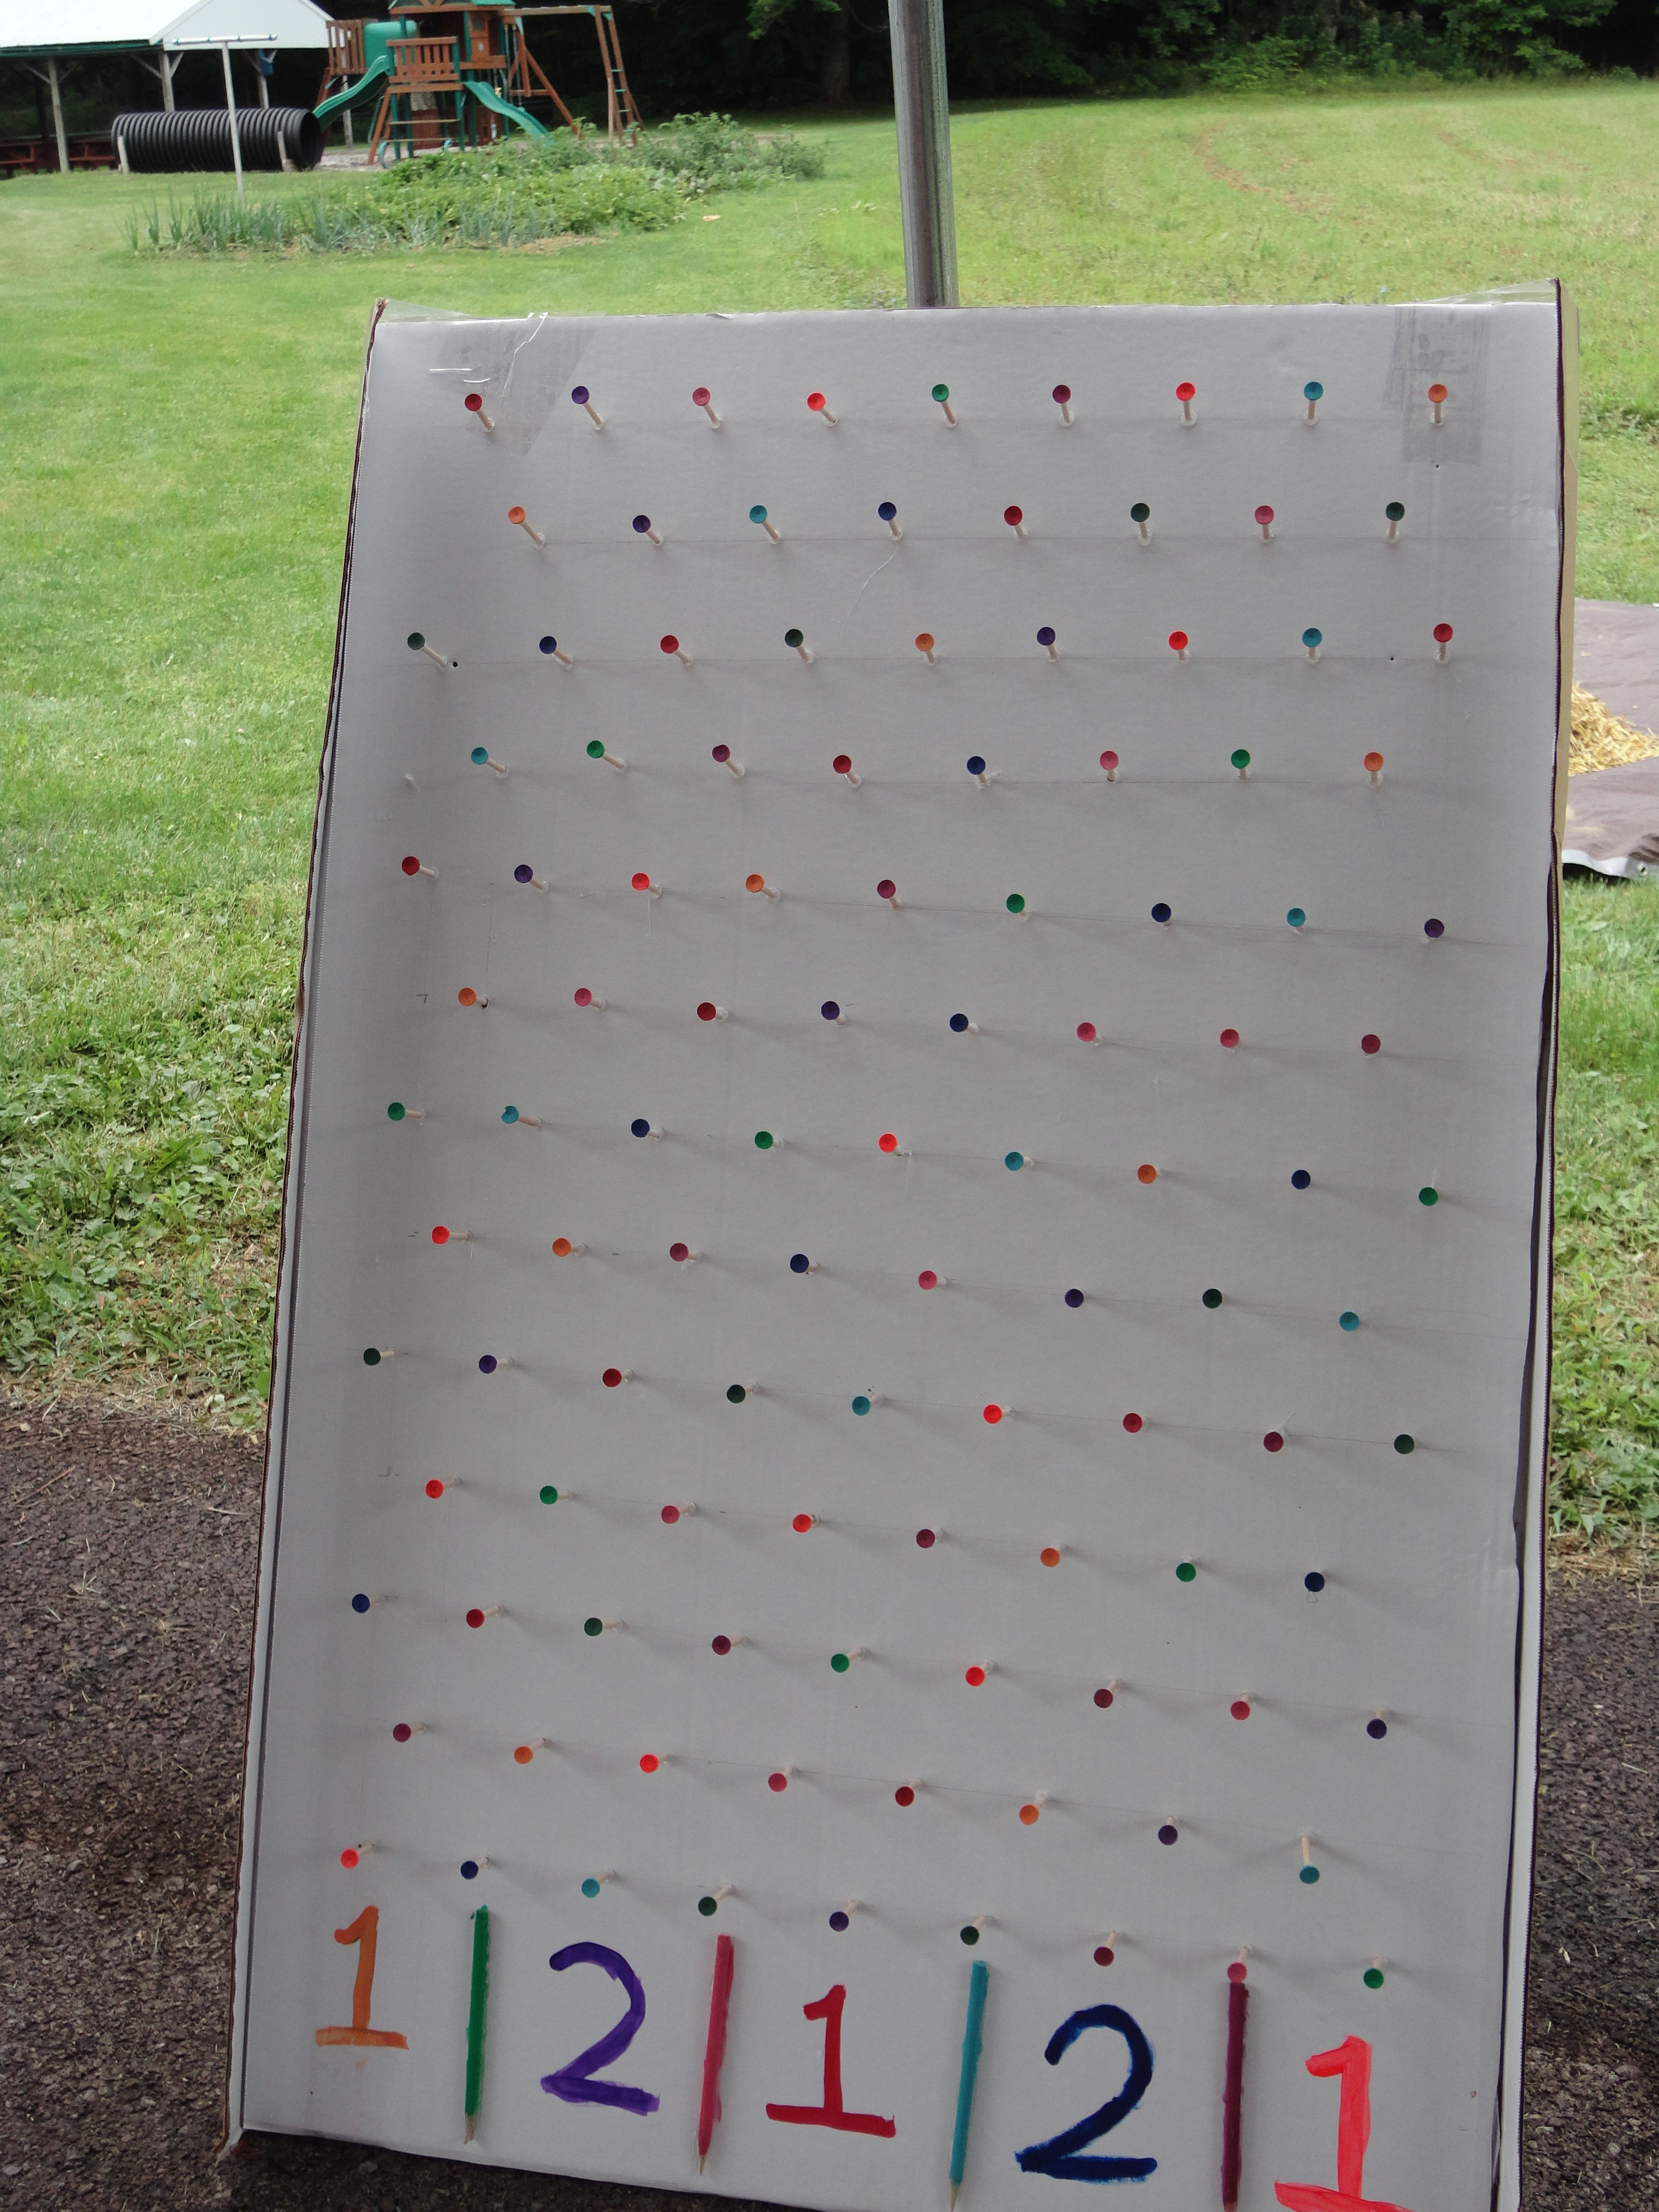 Plinko game triple sheet thickness of cardboard and golf tees i plinko game triple sheet thickness of cardboard and golf tees i used a dot solutioingenieria Choice Image